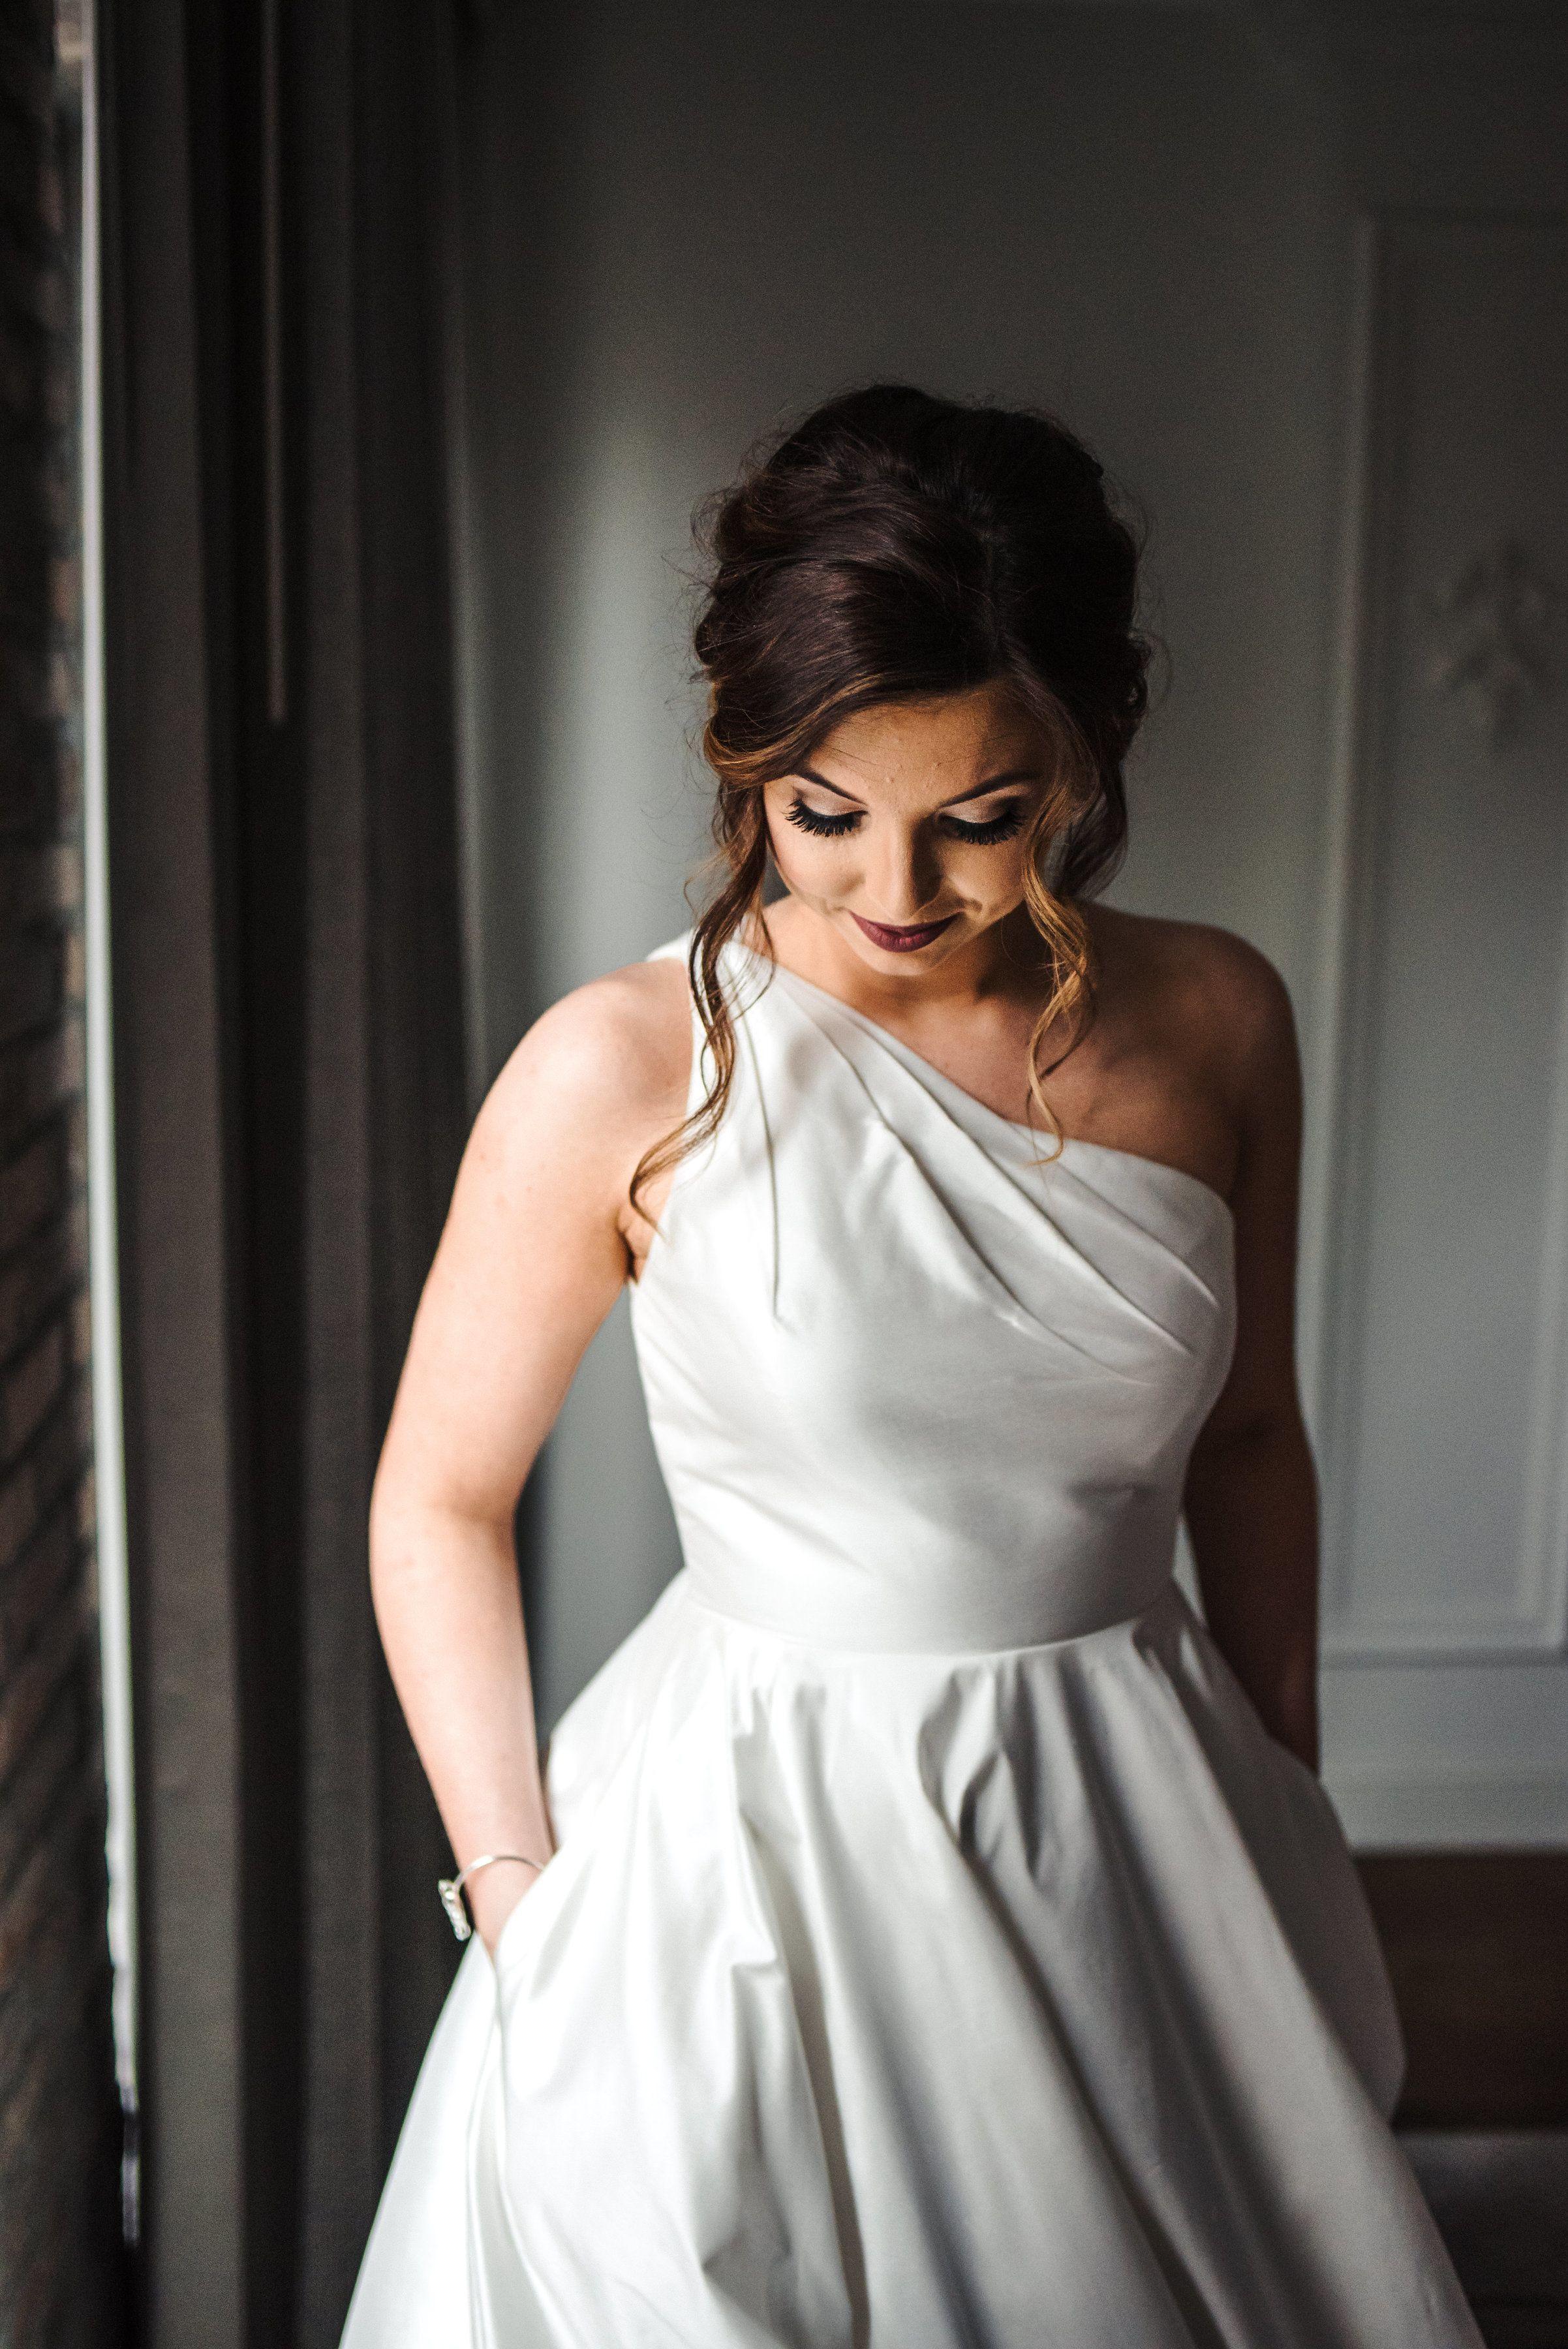 2019 year style- One wedding shoulder dress hair